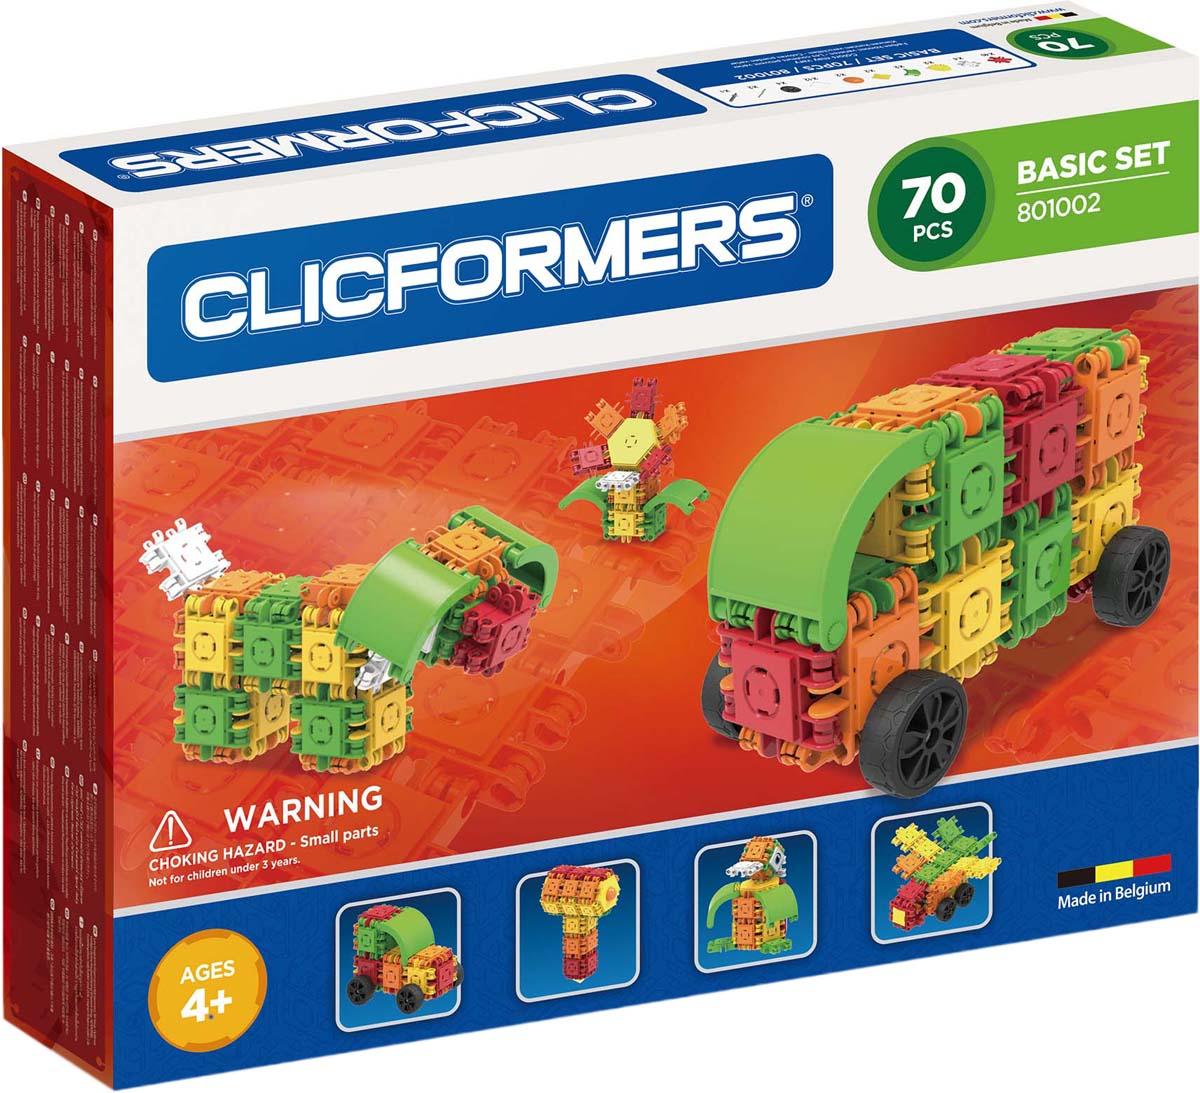 Clicformers Конструктор Basic Set 70 деталей clicformers конструктор clicformers transportation set mini 30 деталей